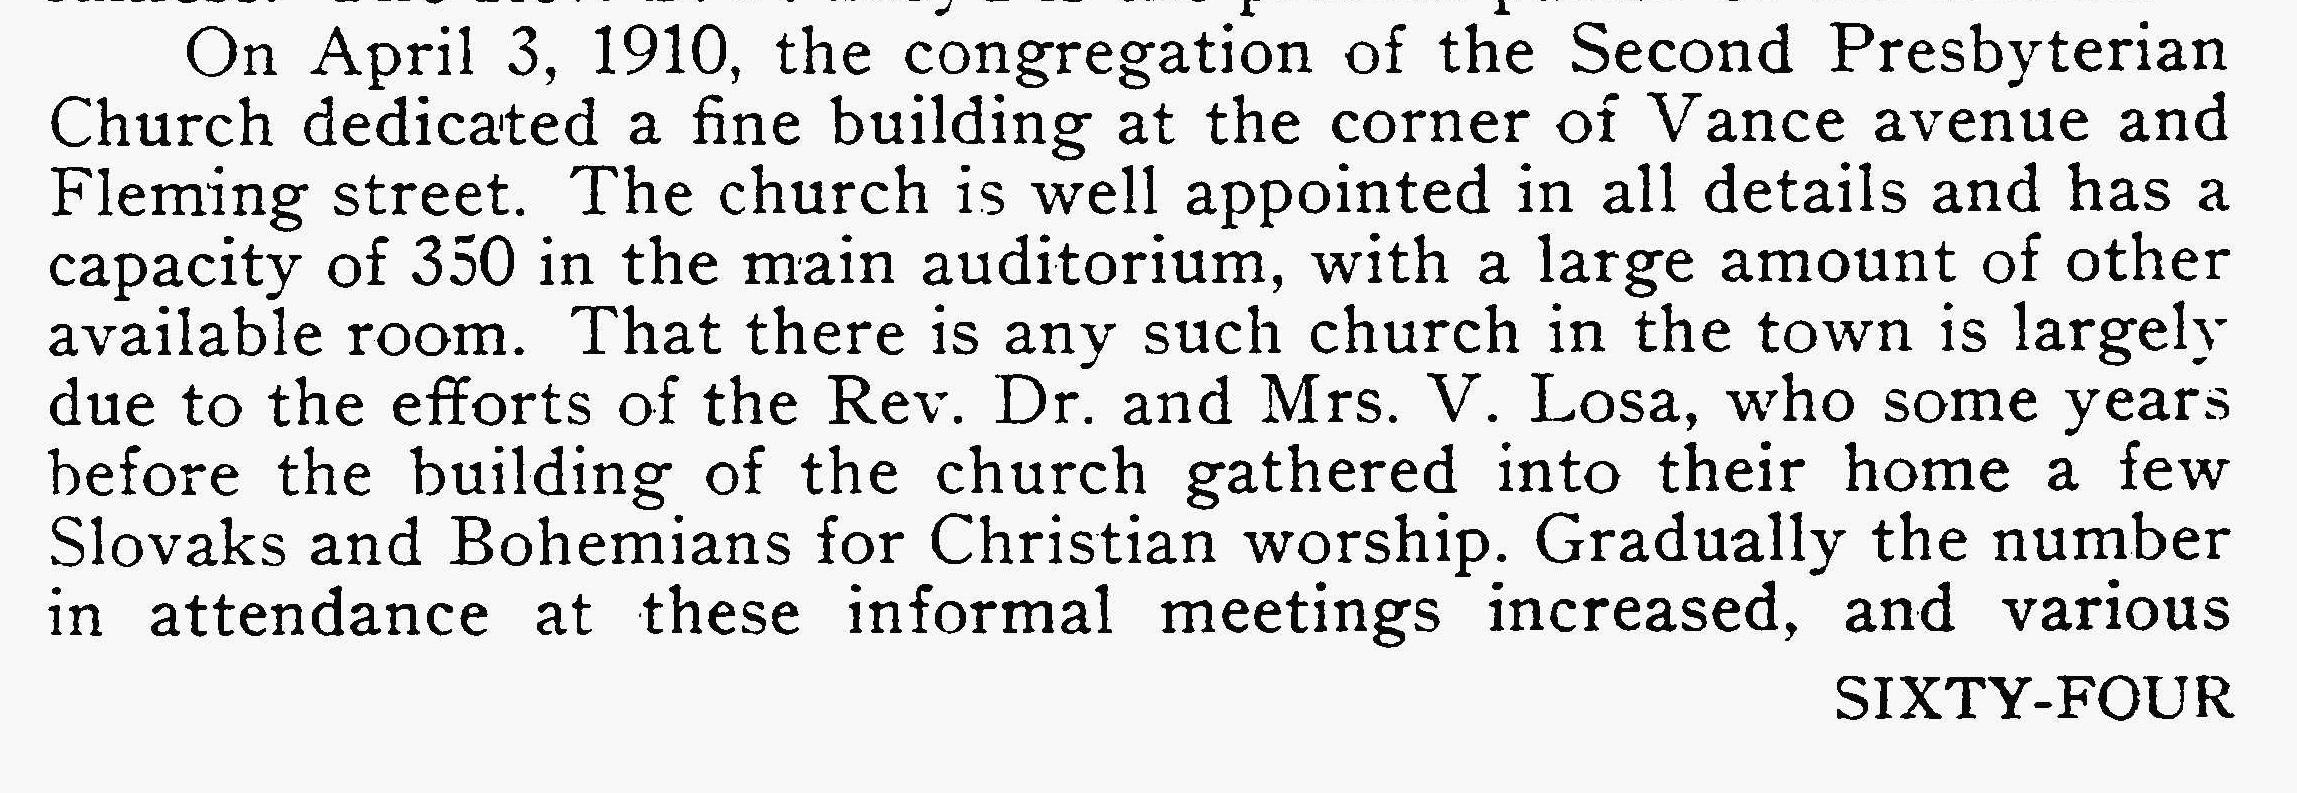 Second Presbyterian Church - Edward S Maurey - Where the West Began (pg64).jpg